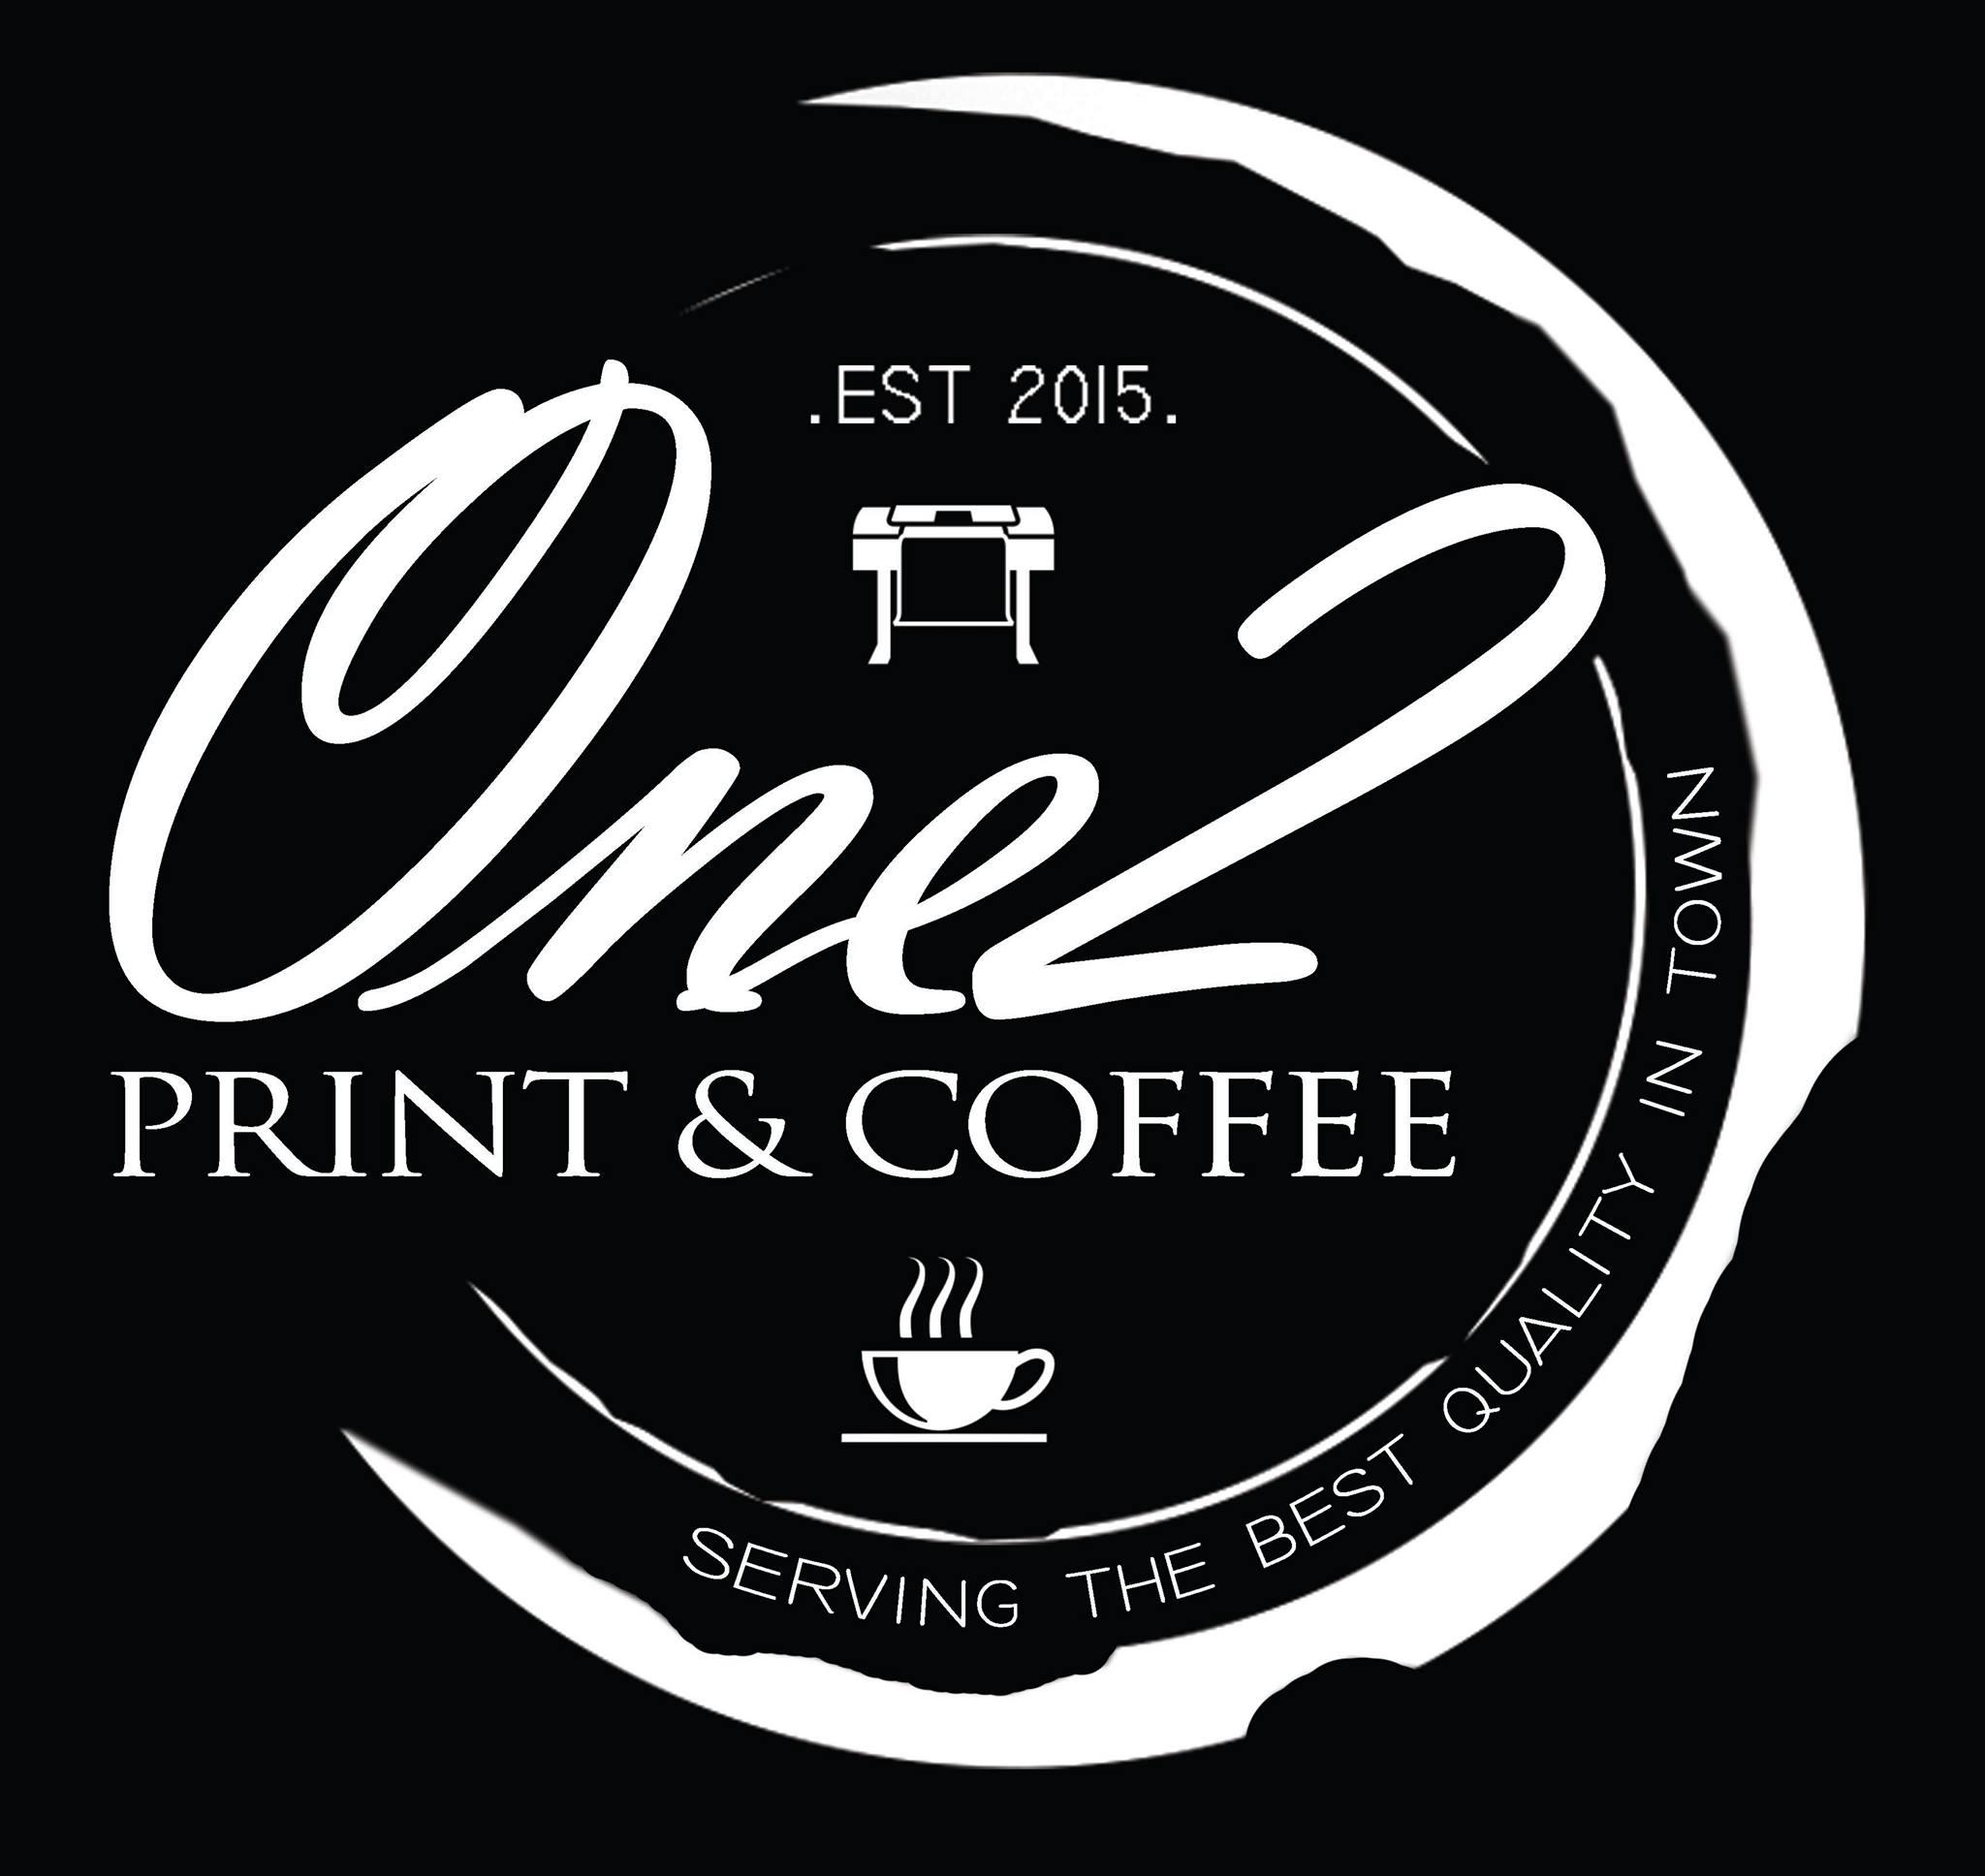 ONE2 PRINT & COFFEE